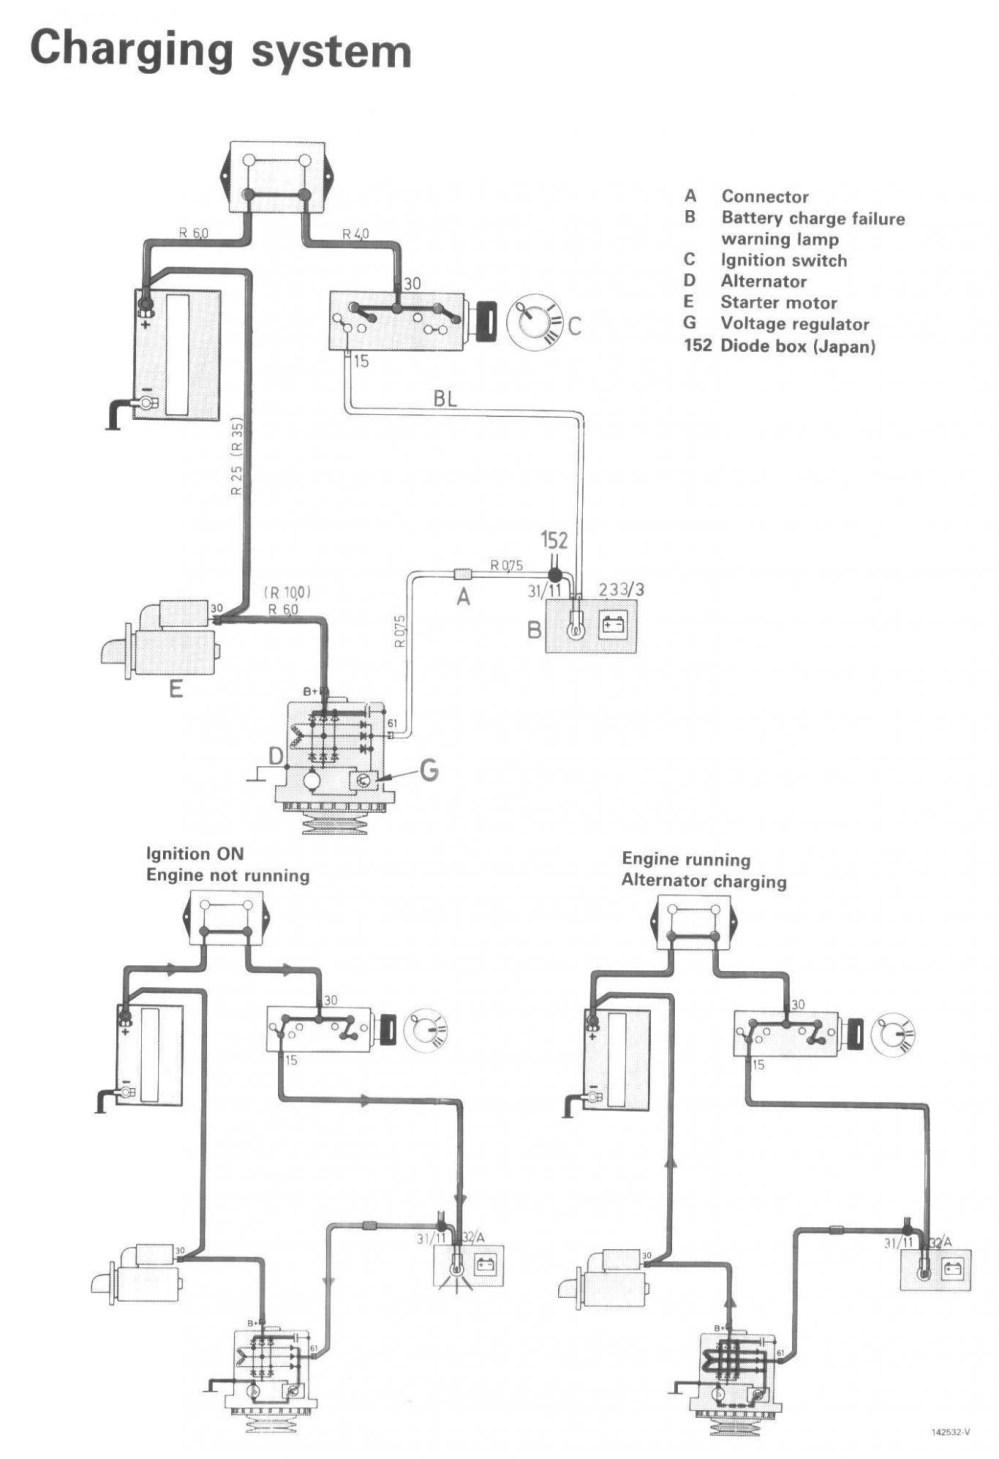 medium resolution of ford one wire alternator wiring diagram wiring diagram e wire alternator new chevy alternator wiring